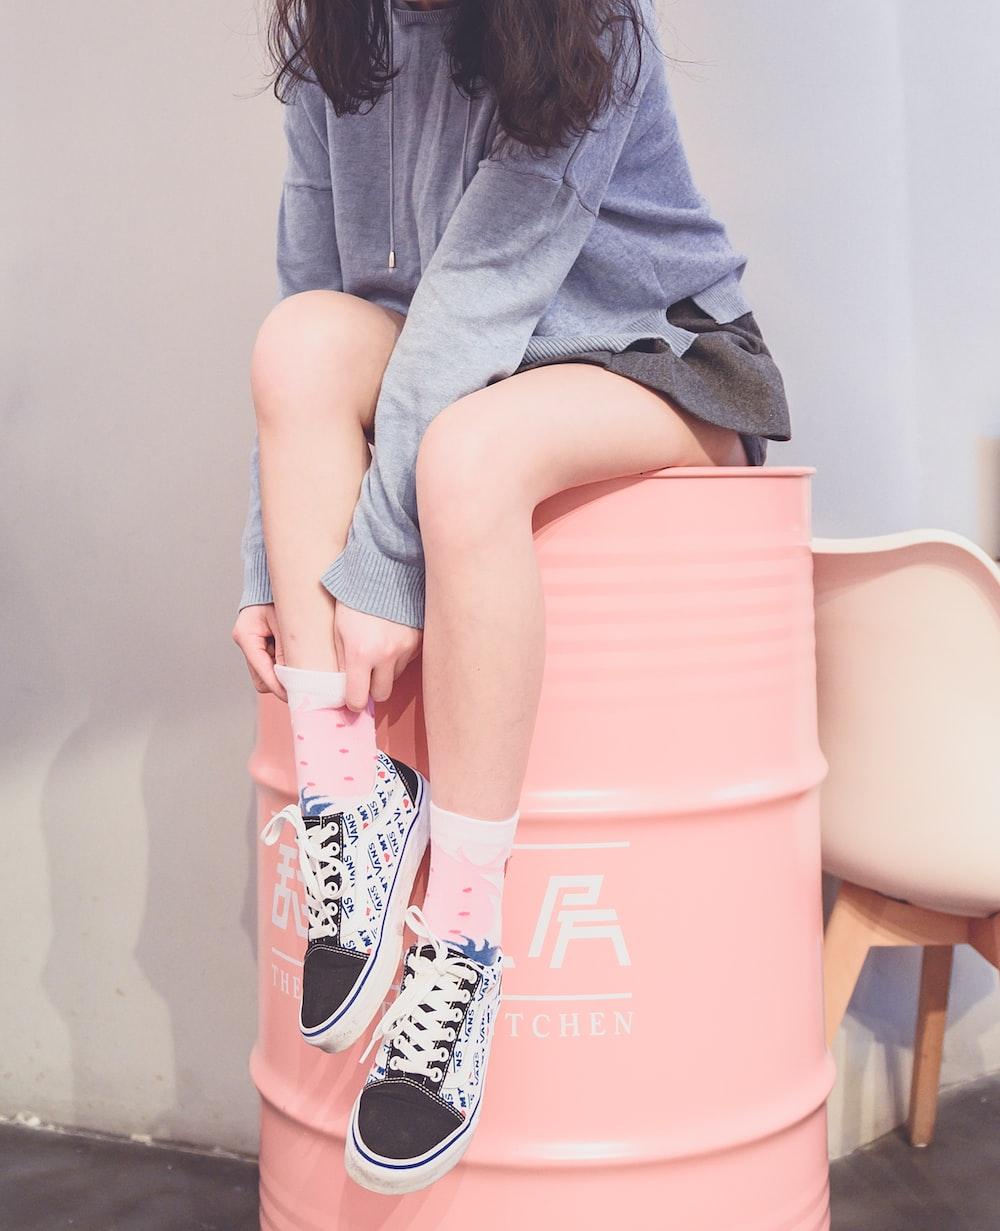 woman sitting on metal barrel